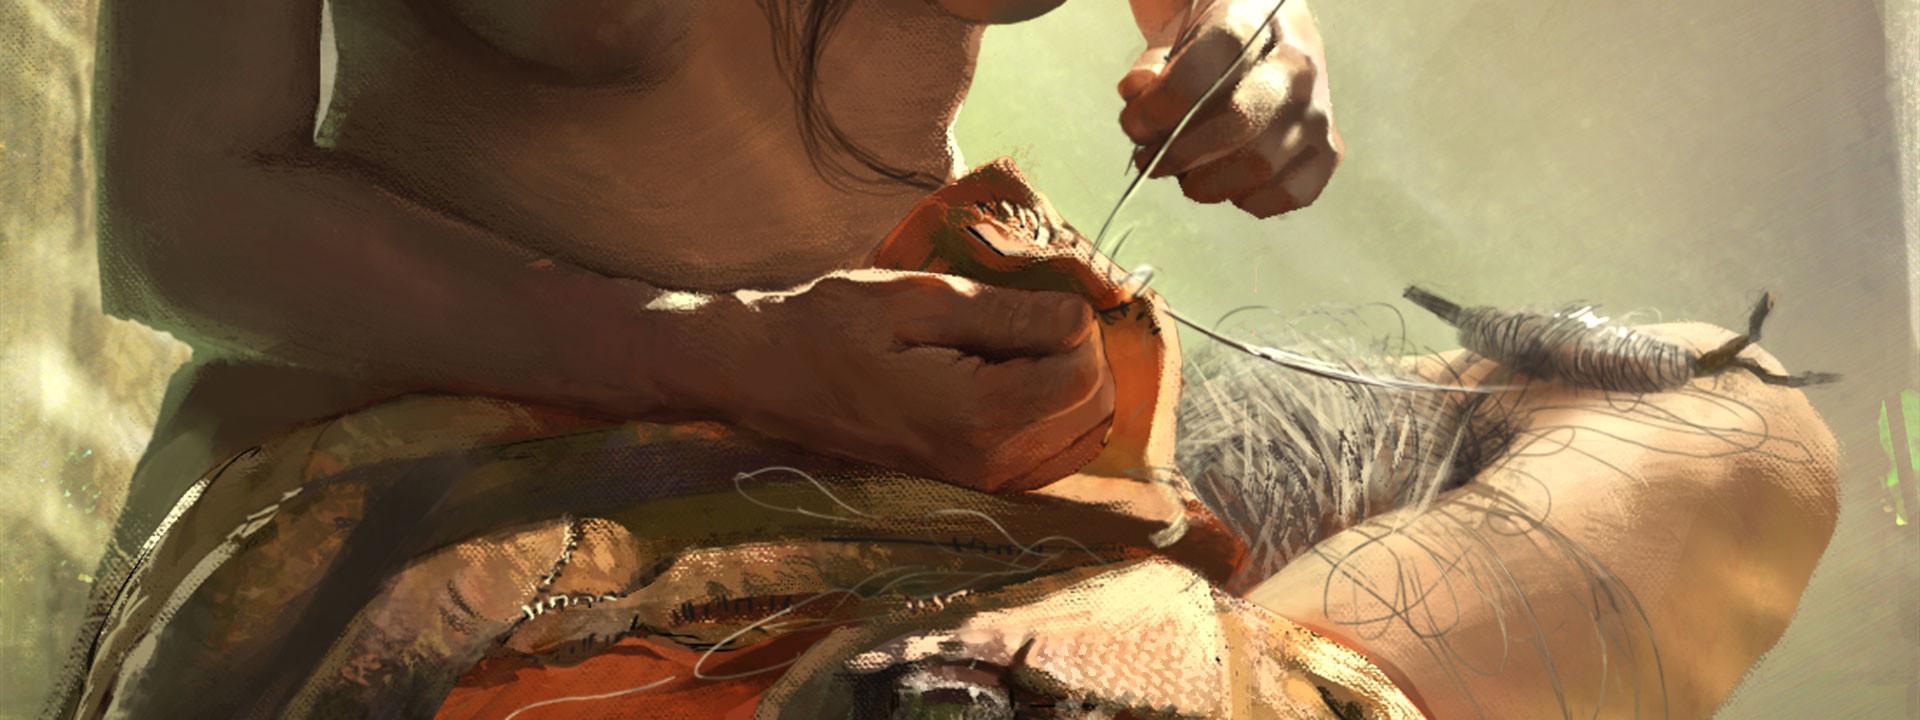 Florian thomasset zzz detail